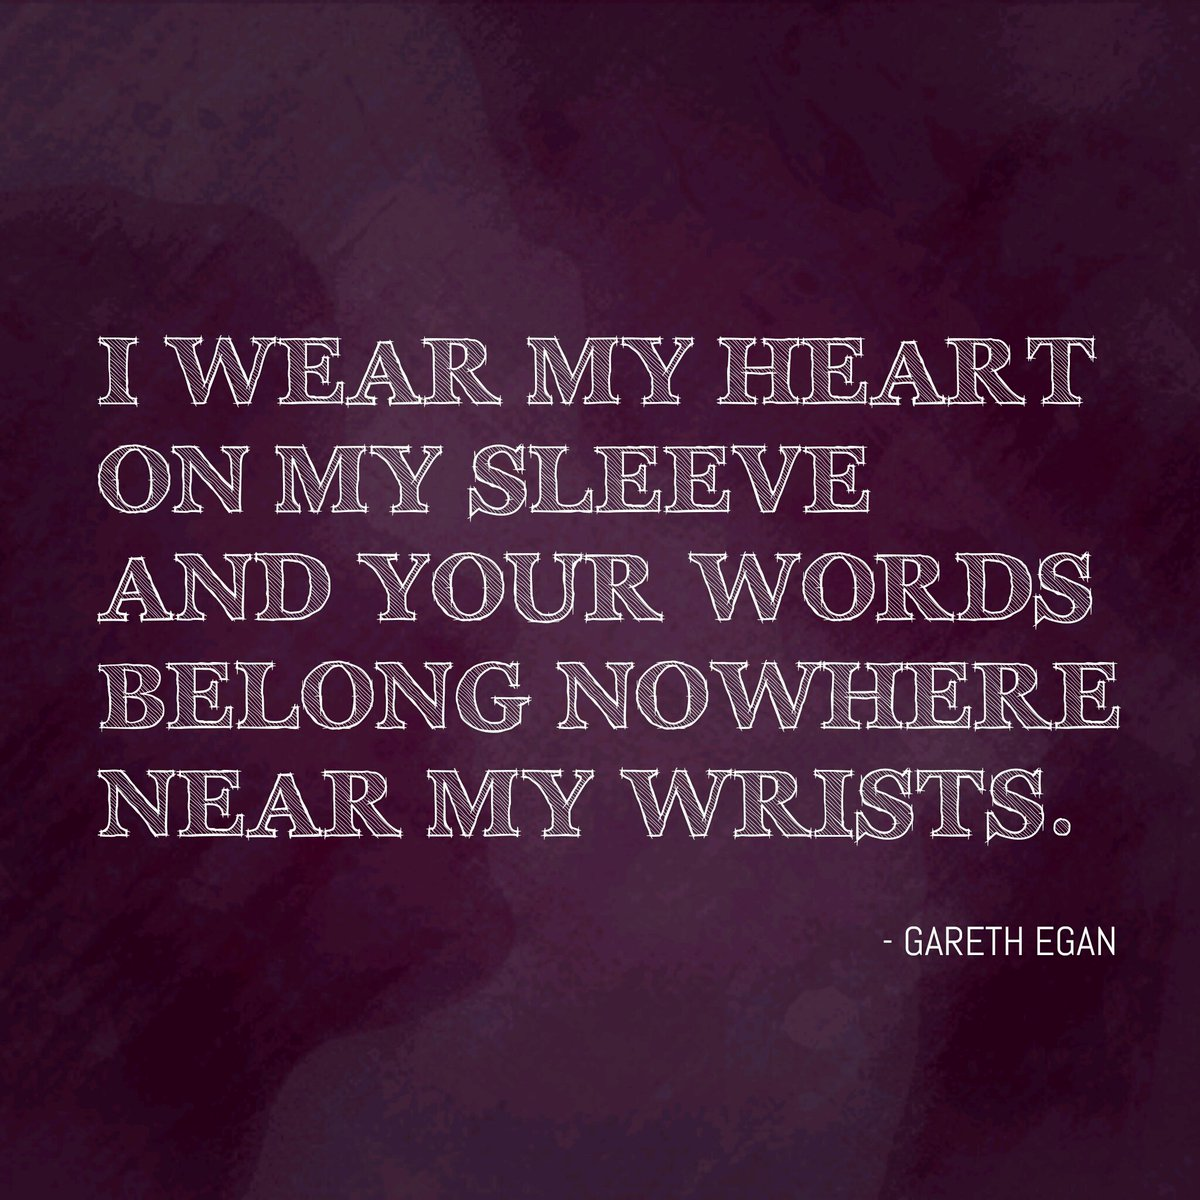 Best Friend Love Poems 1